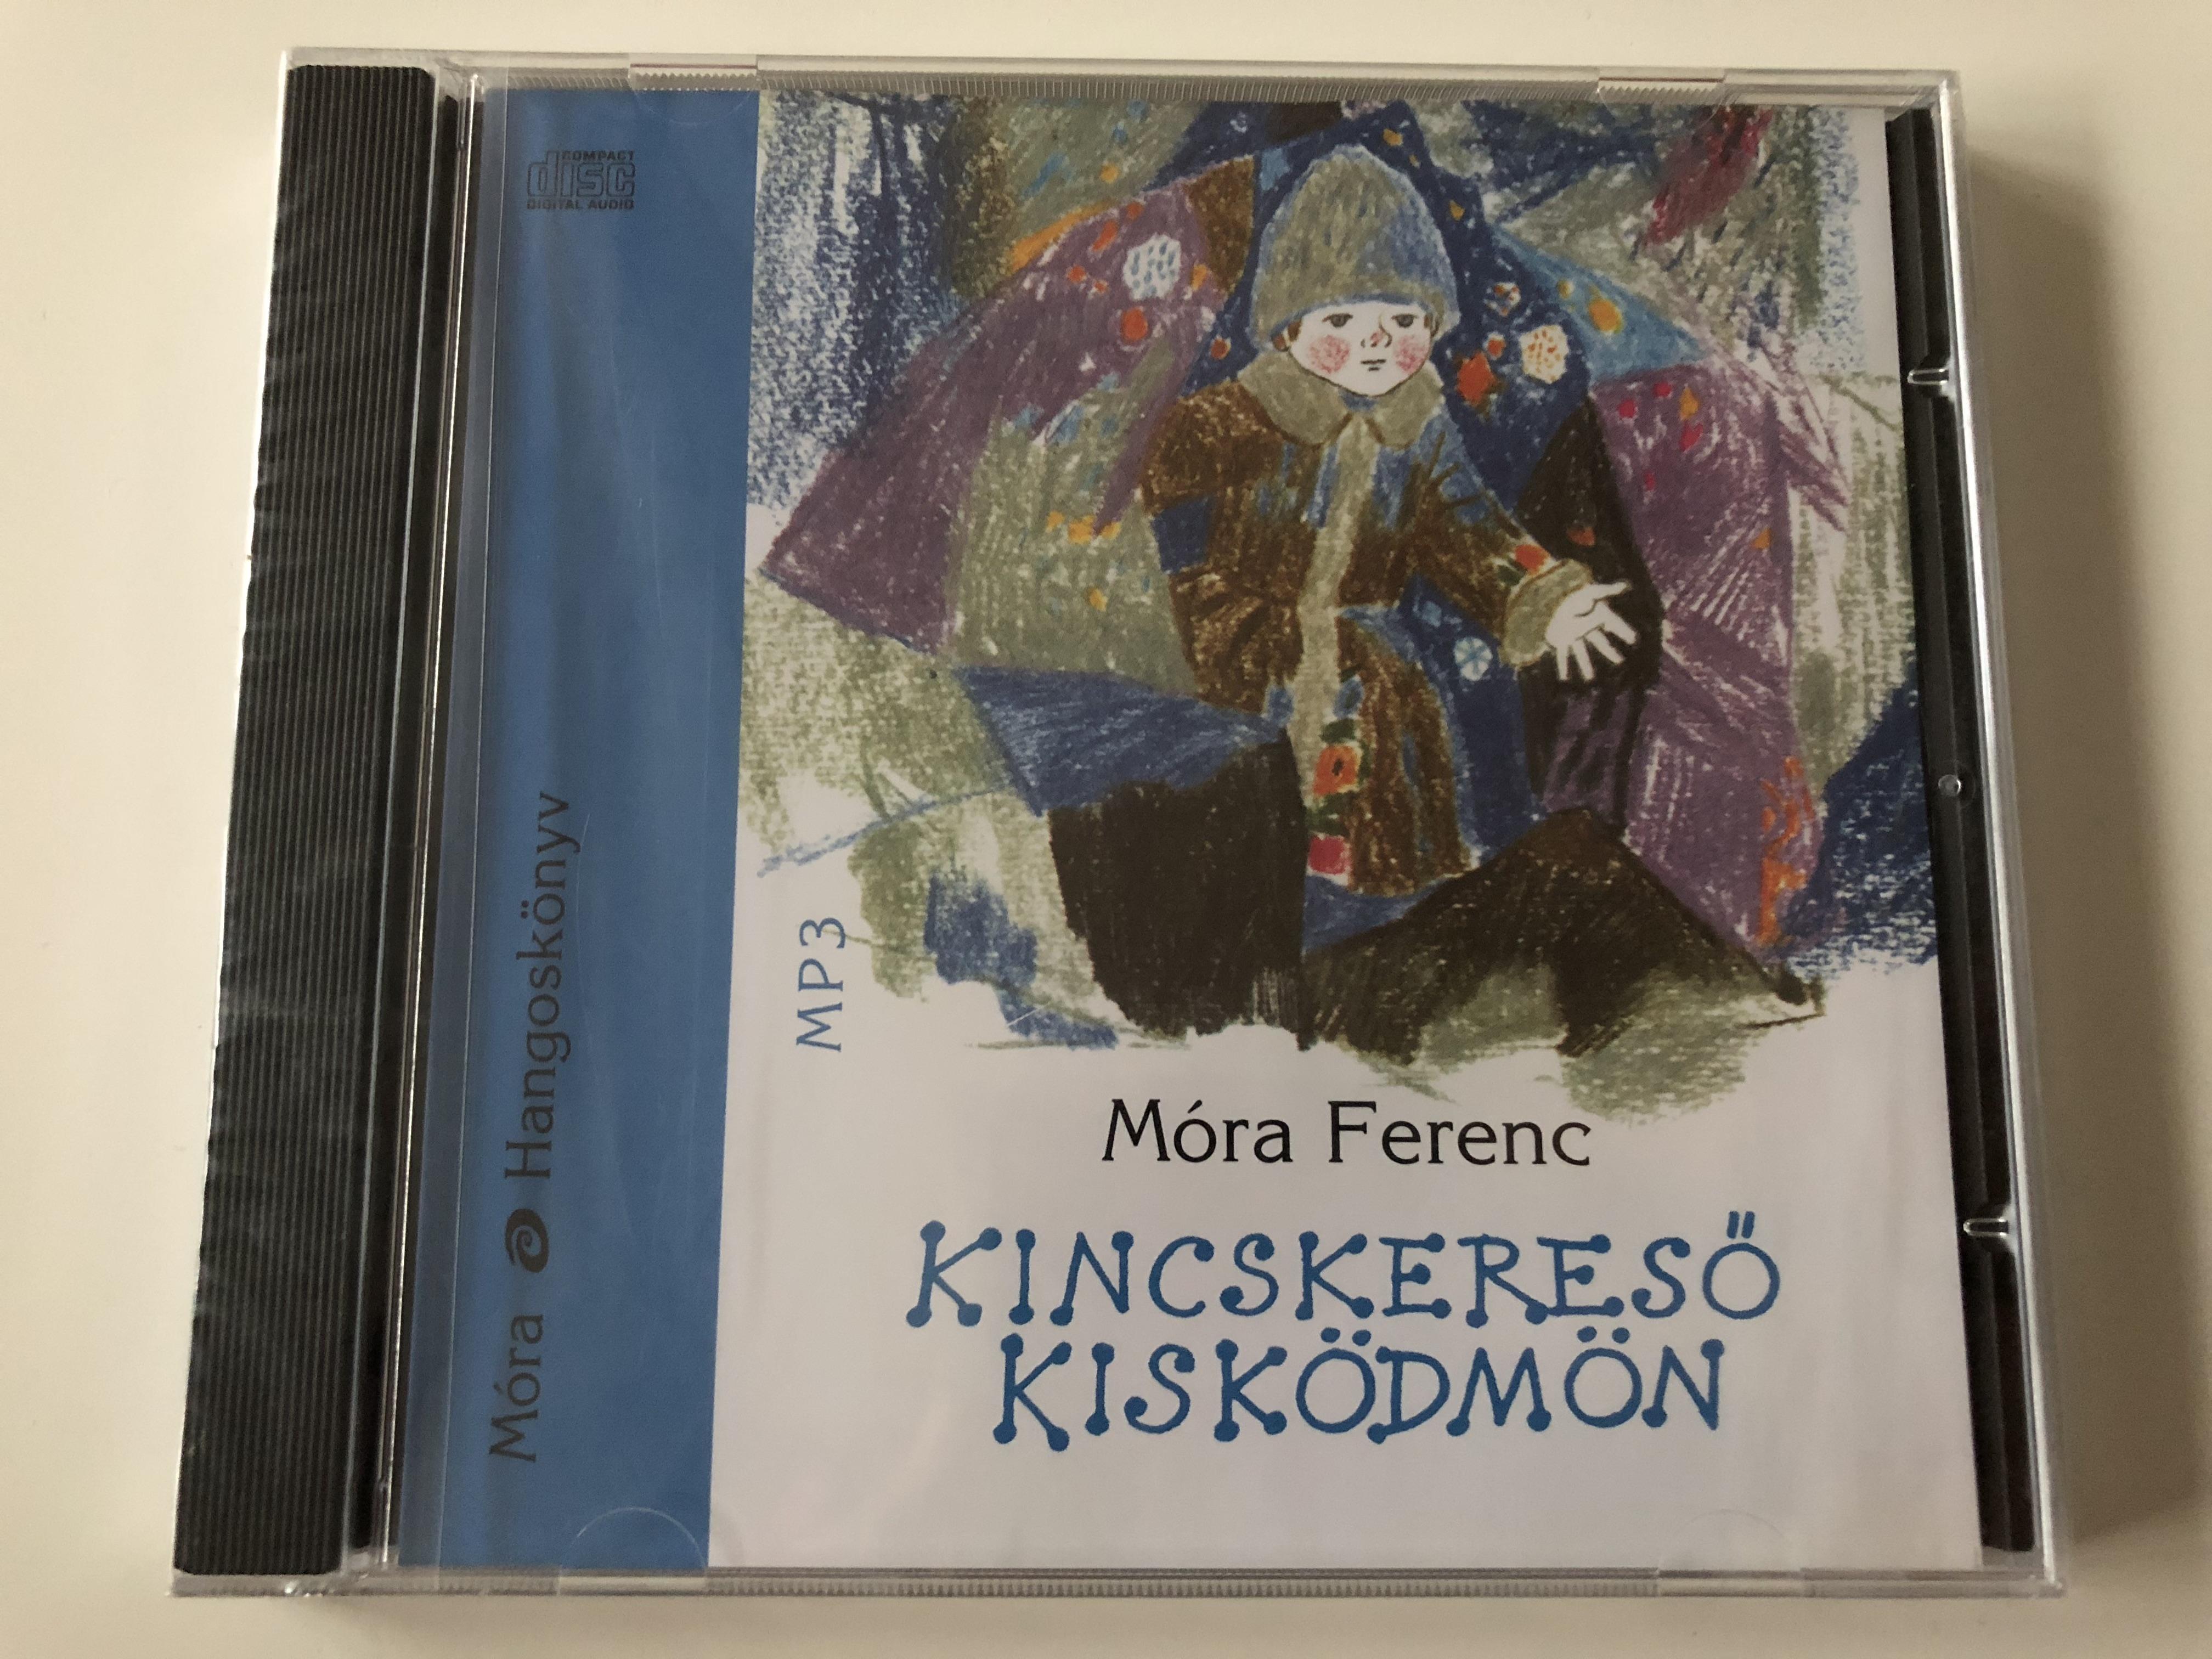 kincskeres-kisk-dm-n-by-m-ra-ferenc-hungarian-language-mp3-audio-book-read-by-sz-les-tam-s-m-ra-k-nyvkiad-2010-1-.jpg